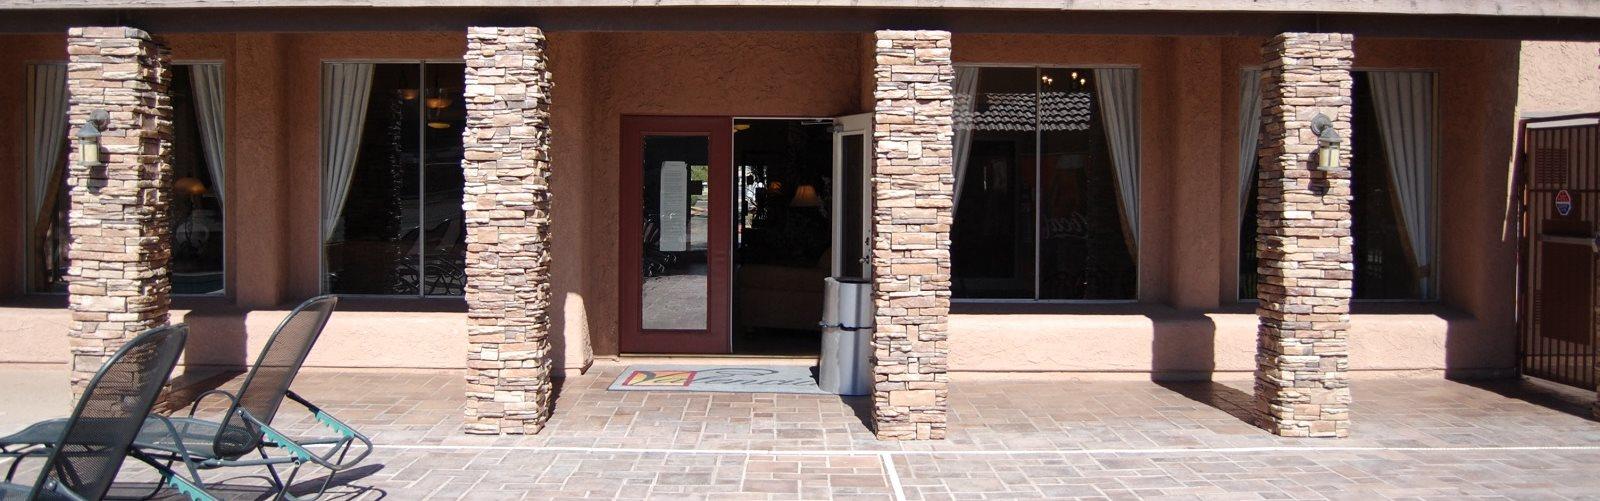 Exterior Valencia Las Vegas, Nevada